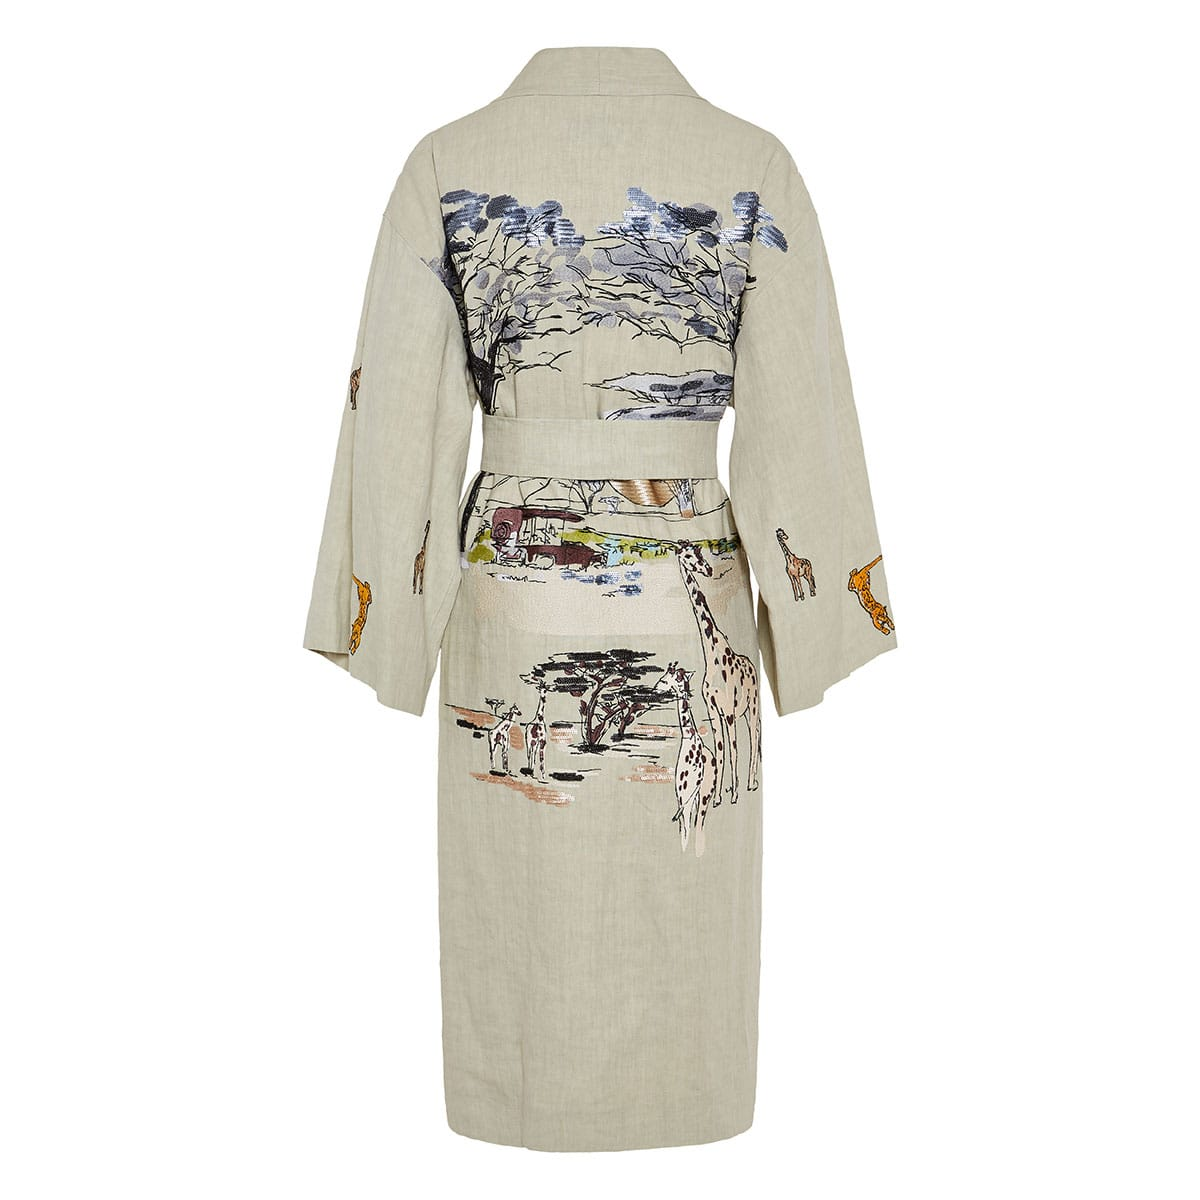 Malva embroidered linen robe-coat